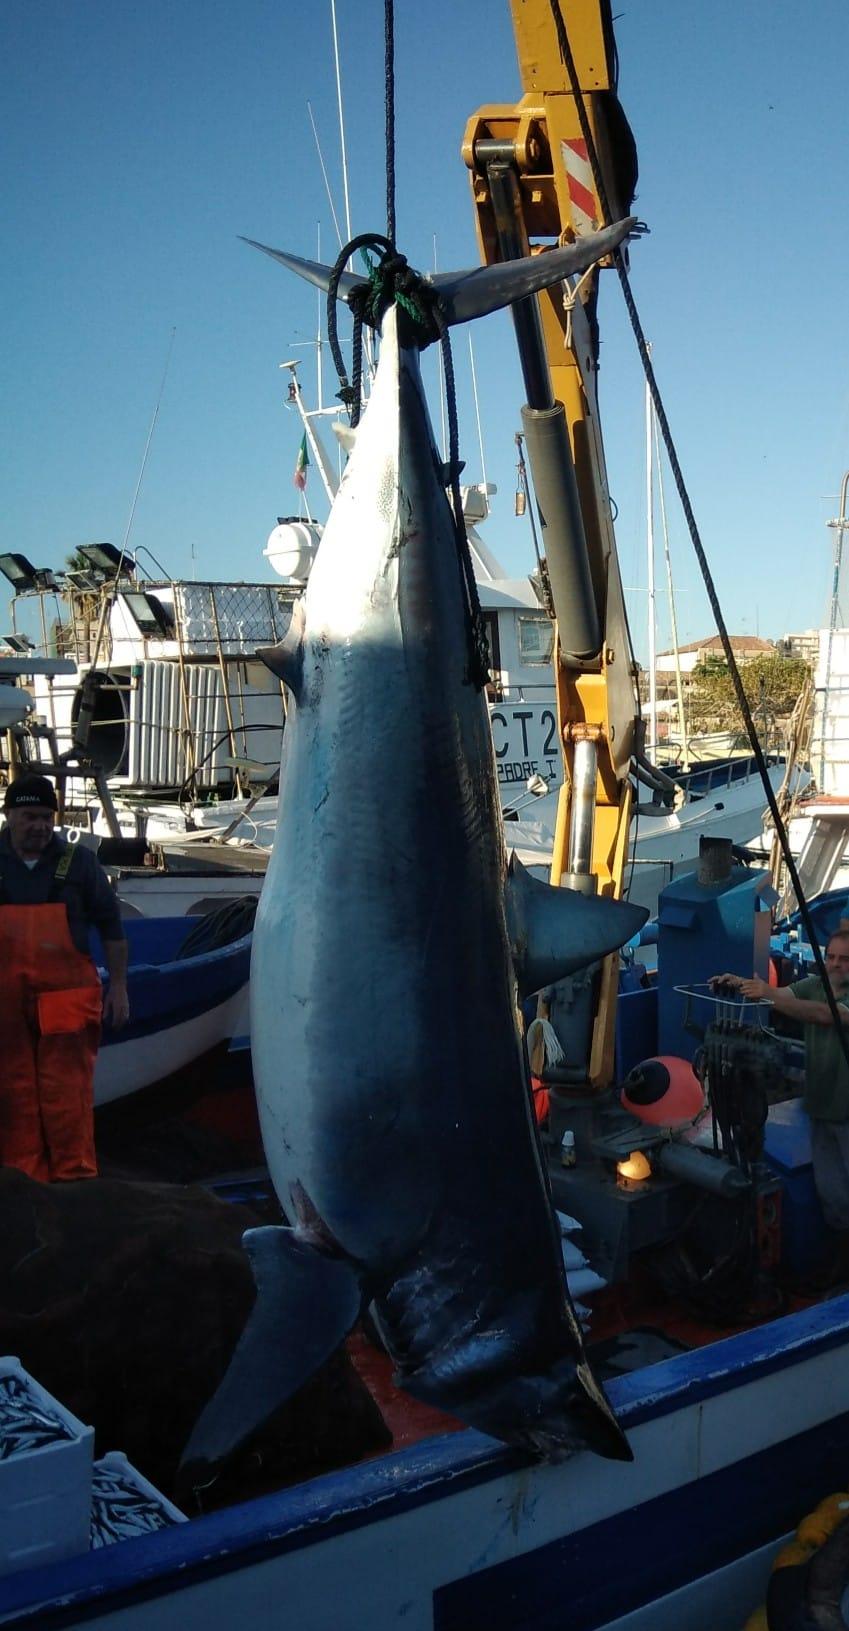 squalo-catania-2